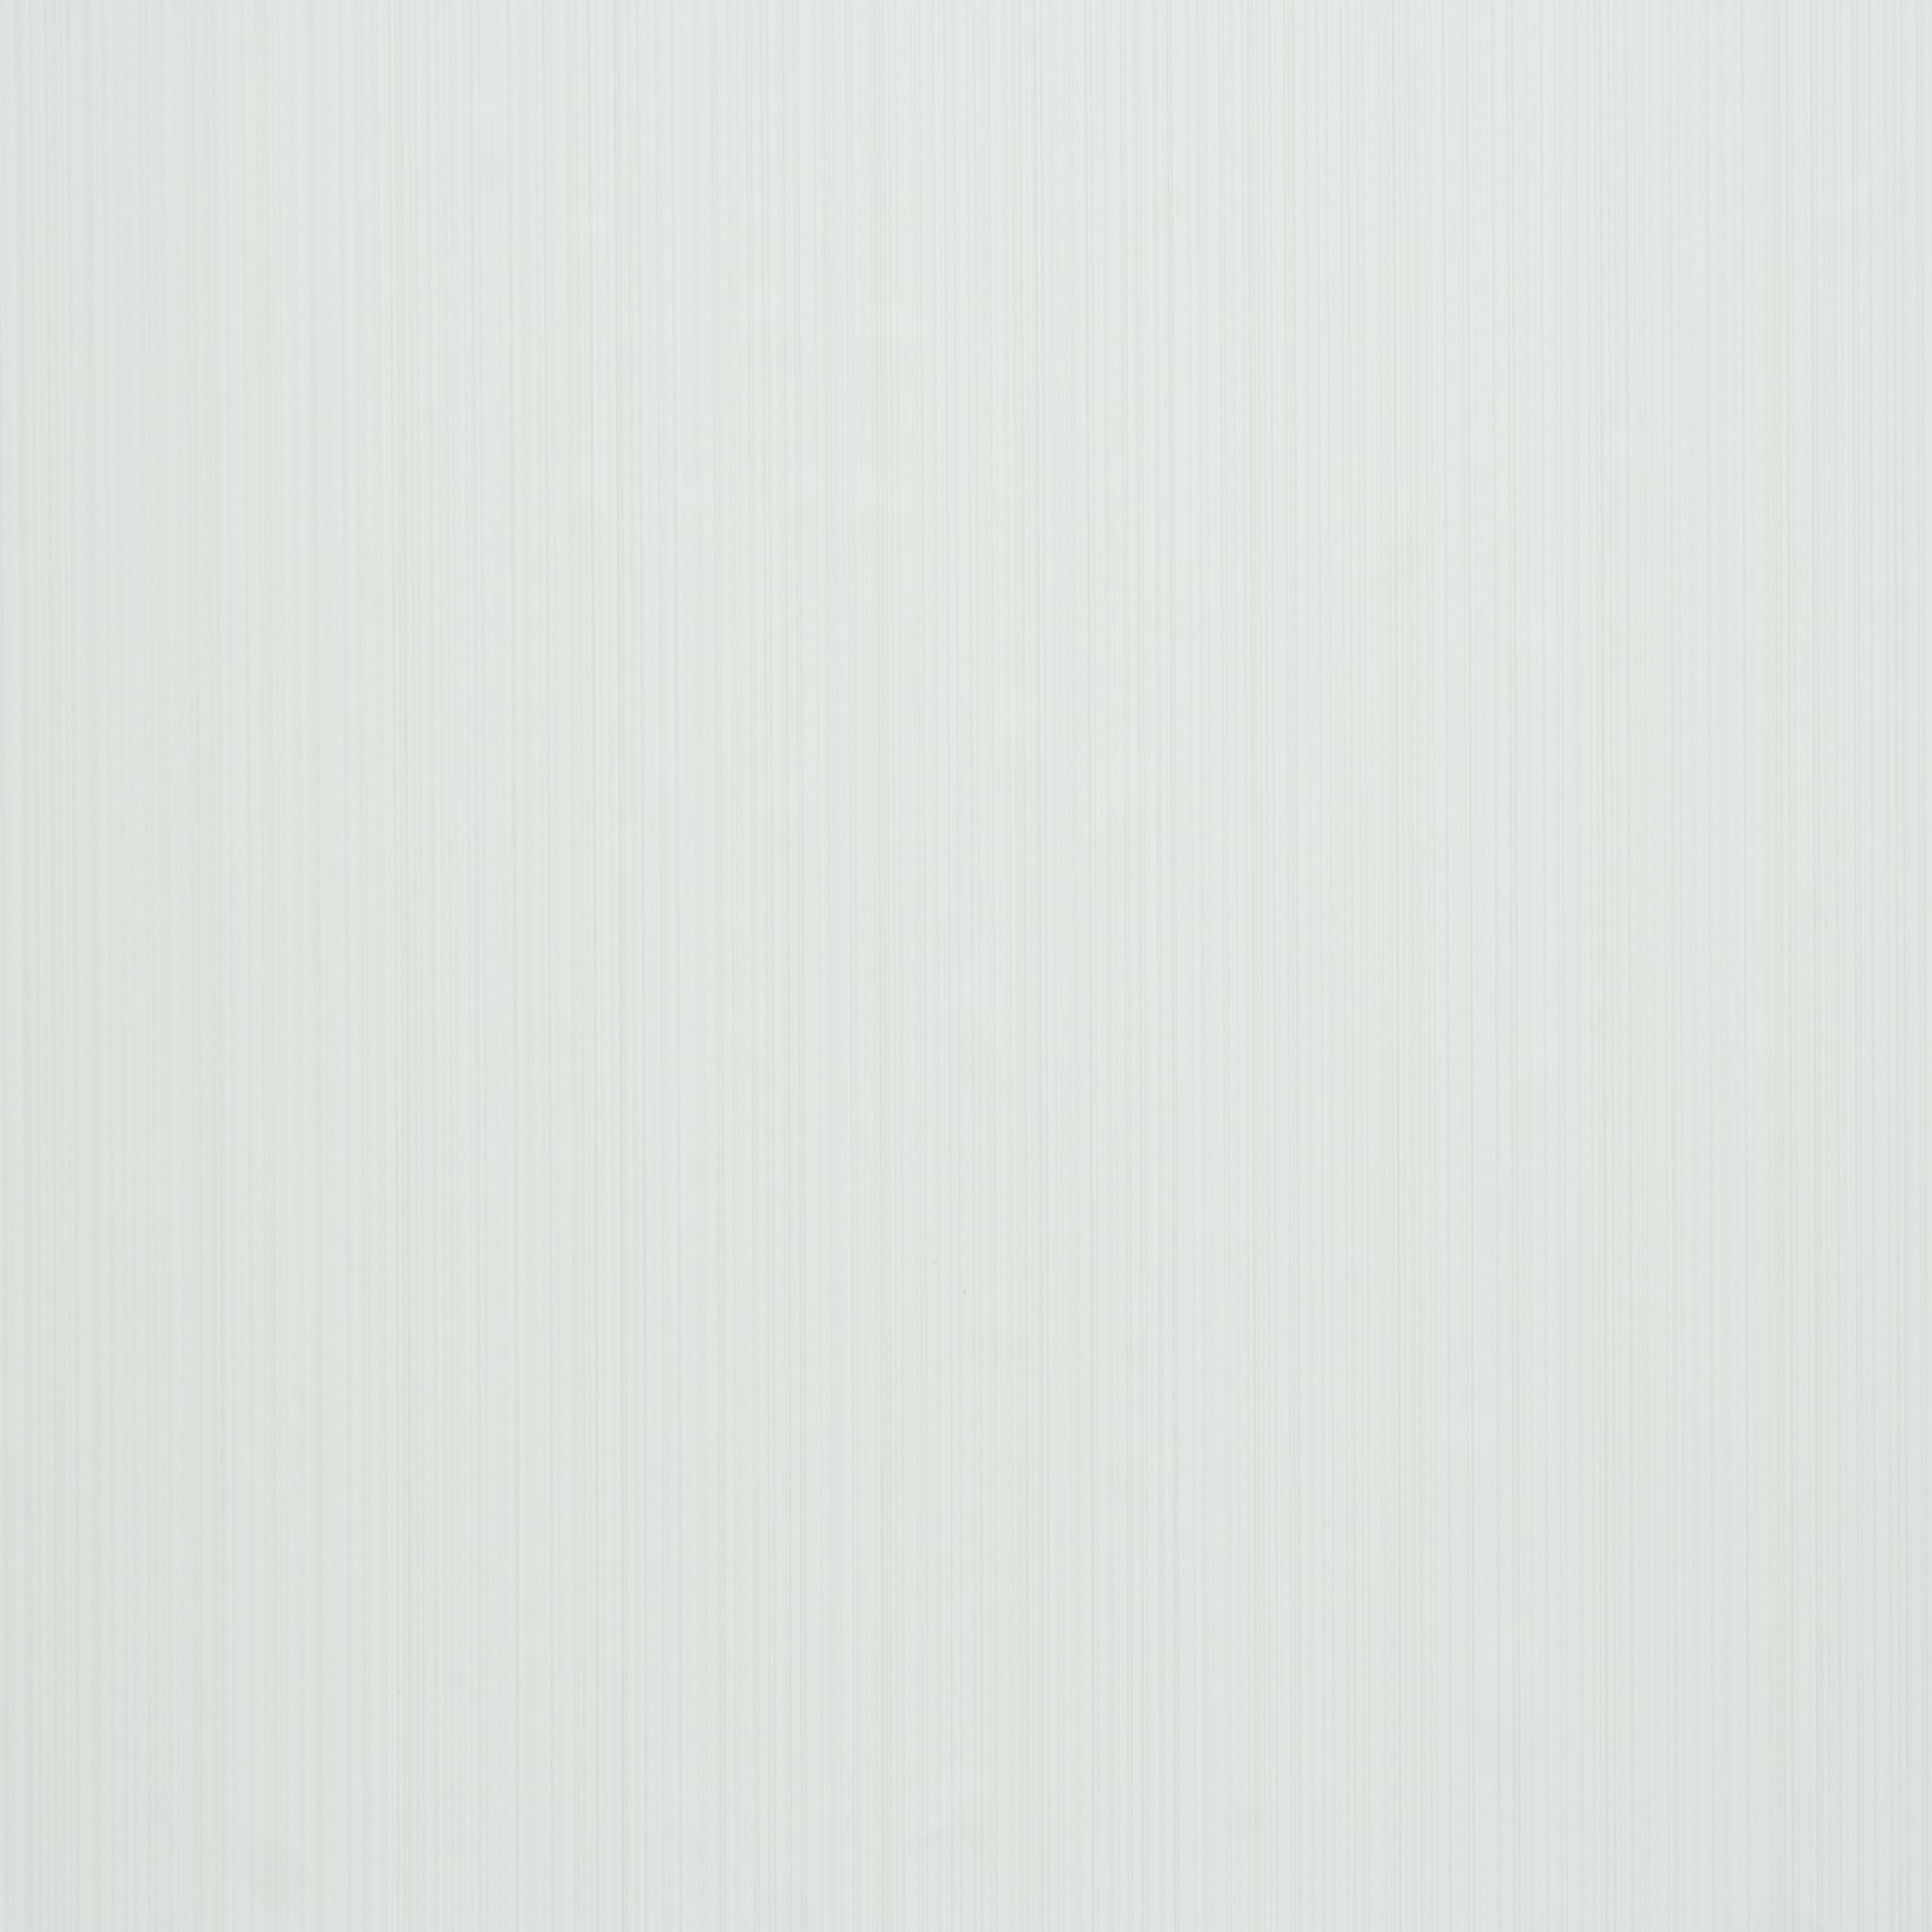 Обои  BN International,  коллекция Colour Line, артикул49113